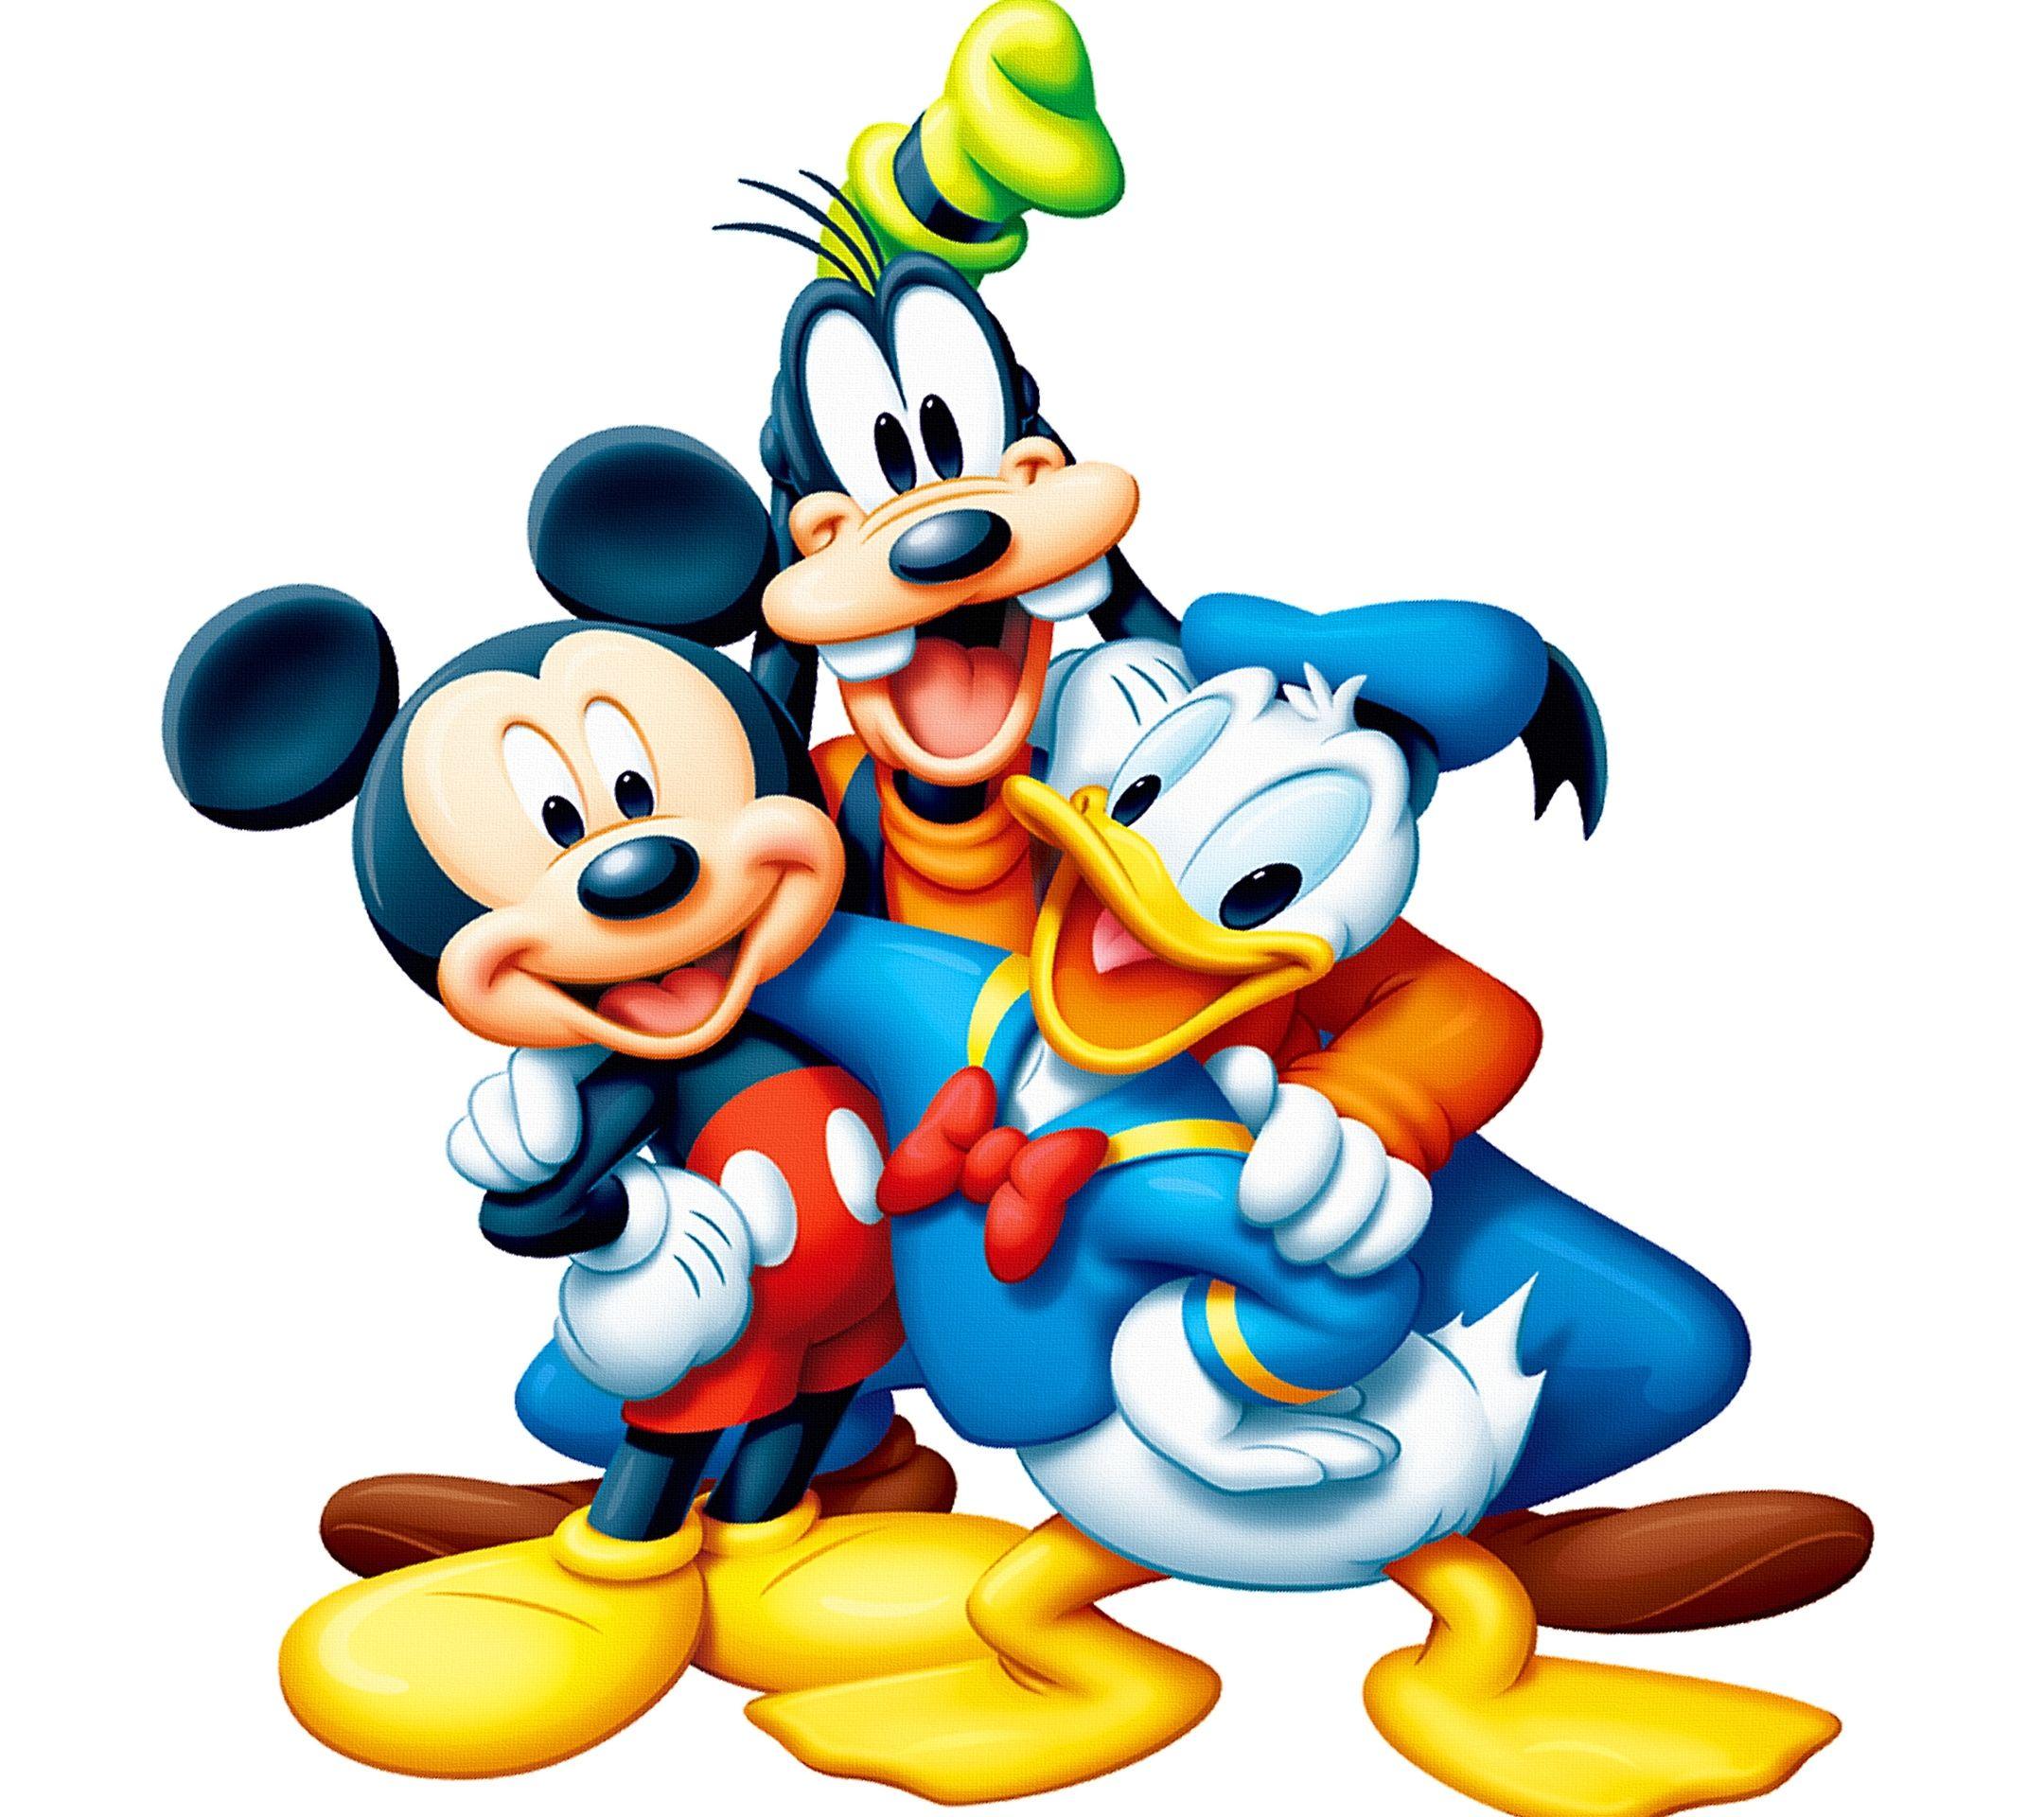 Donald Duck Wallpapers Free Download Wallpaper Hd